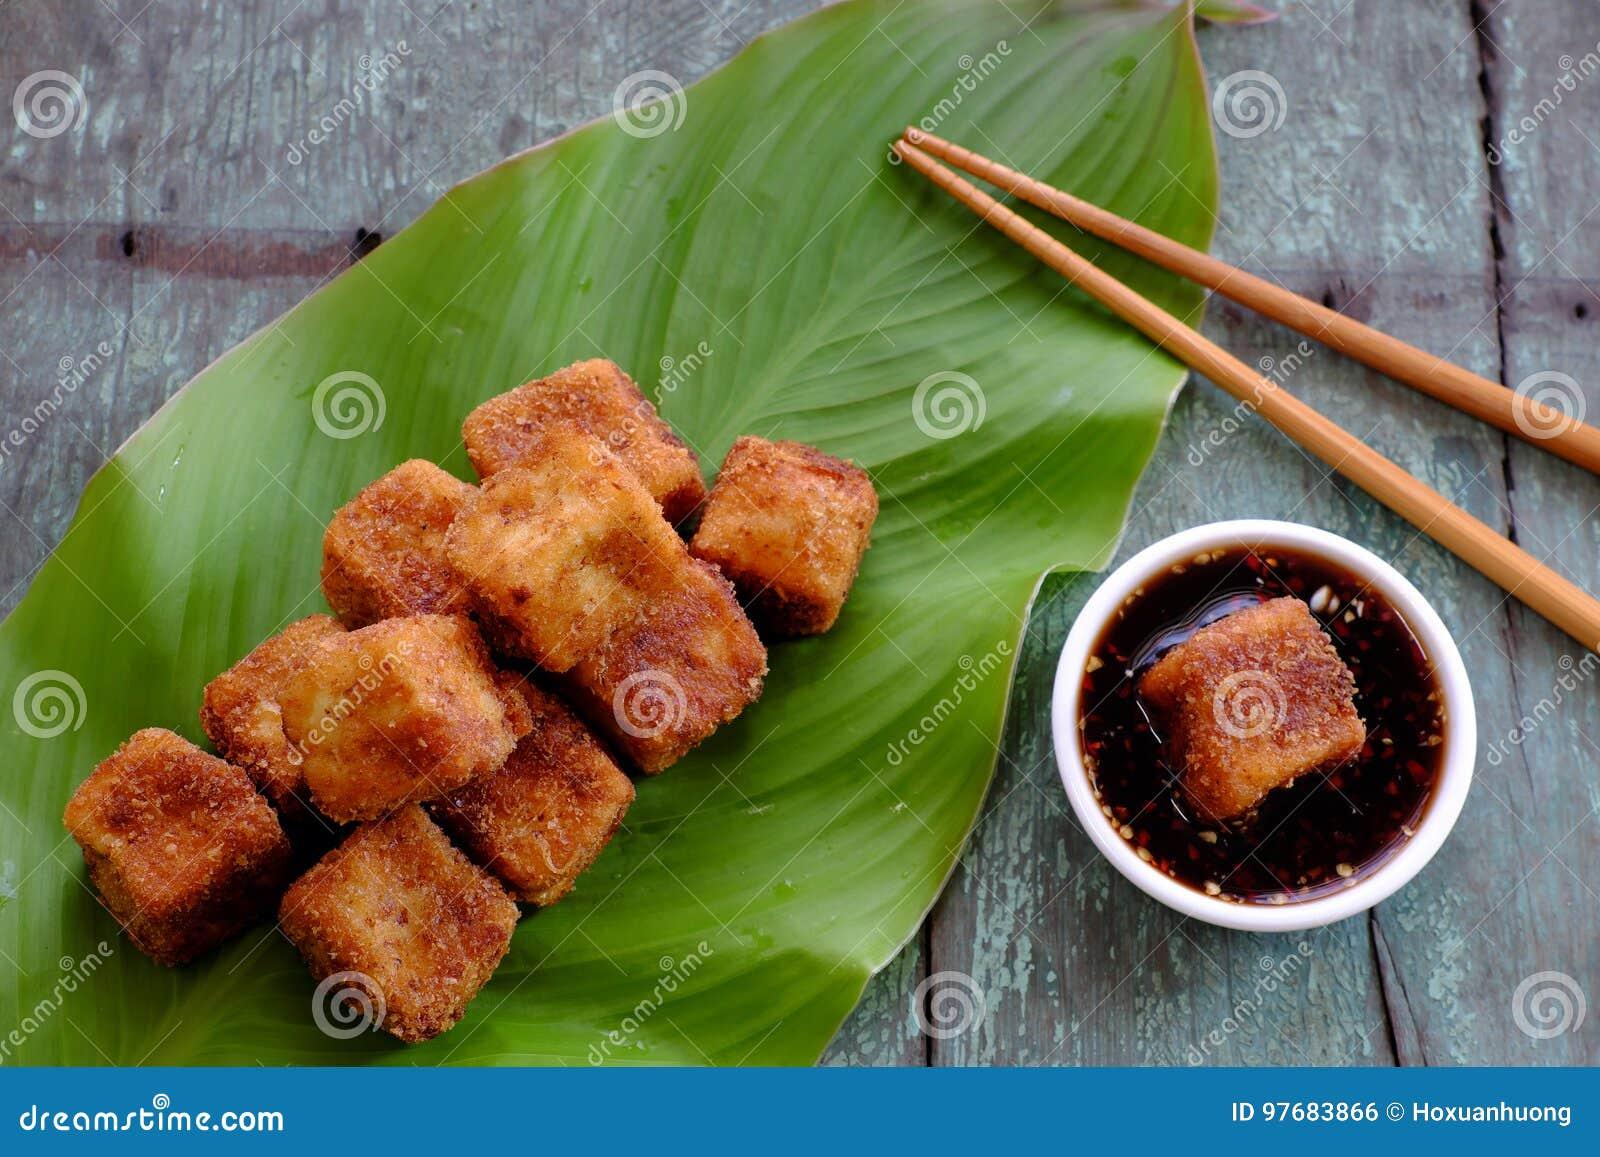 Vegetarian food, fried tofu